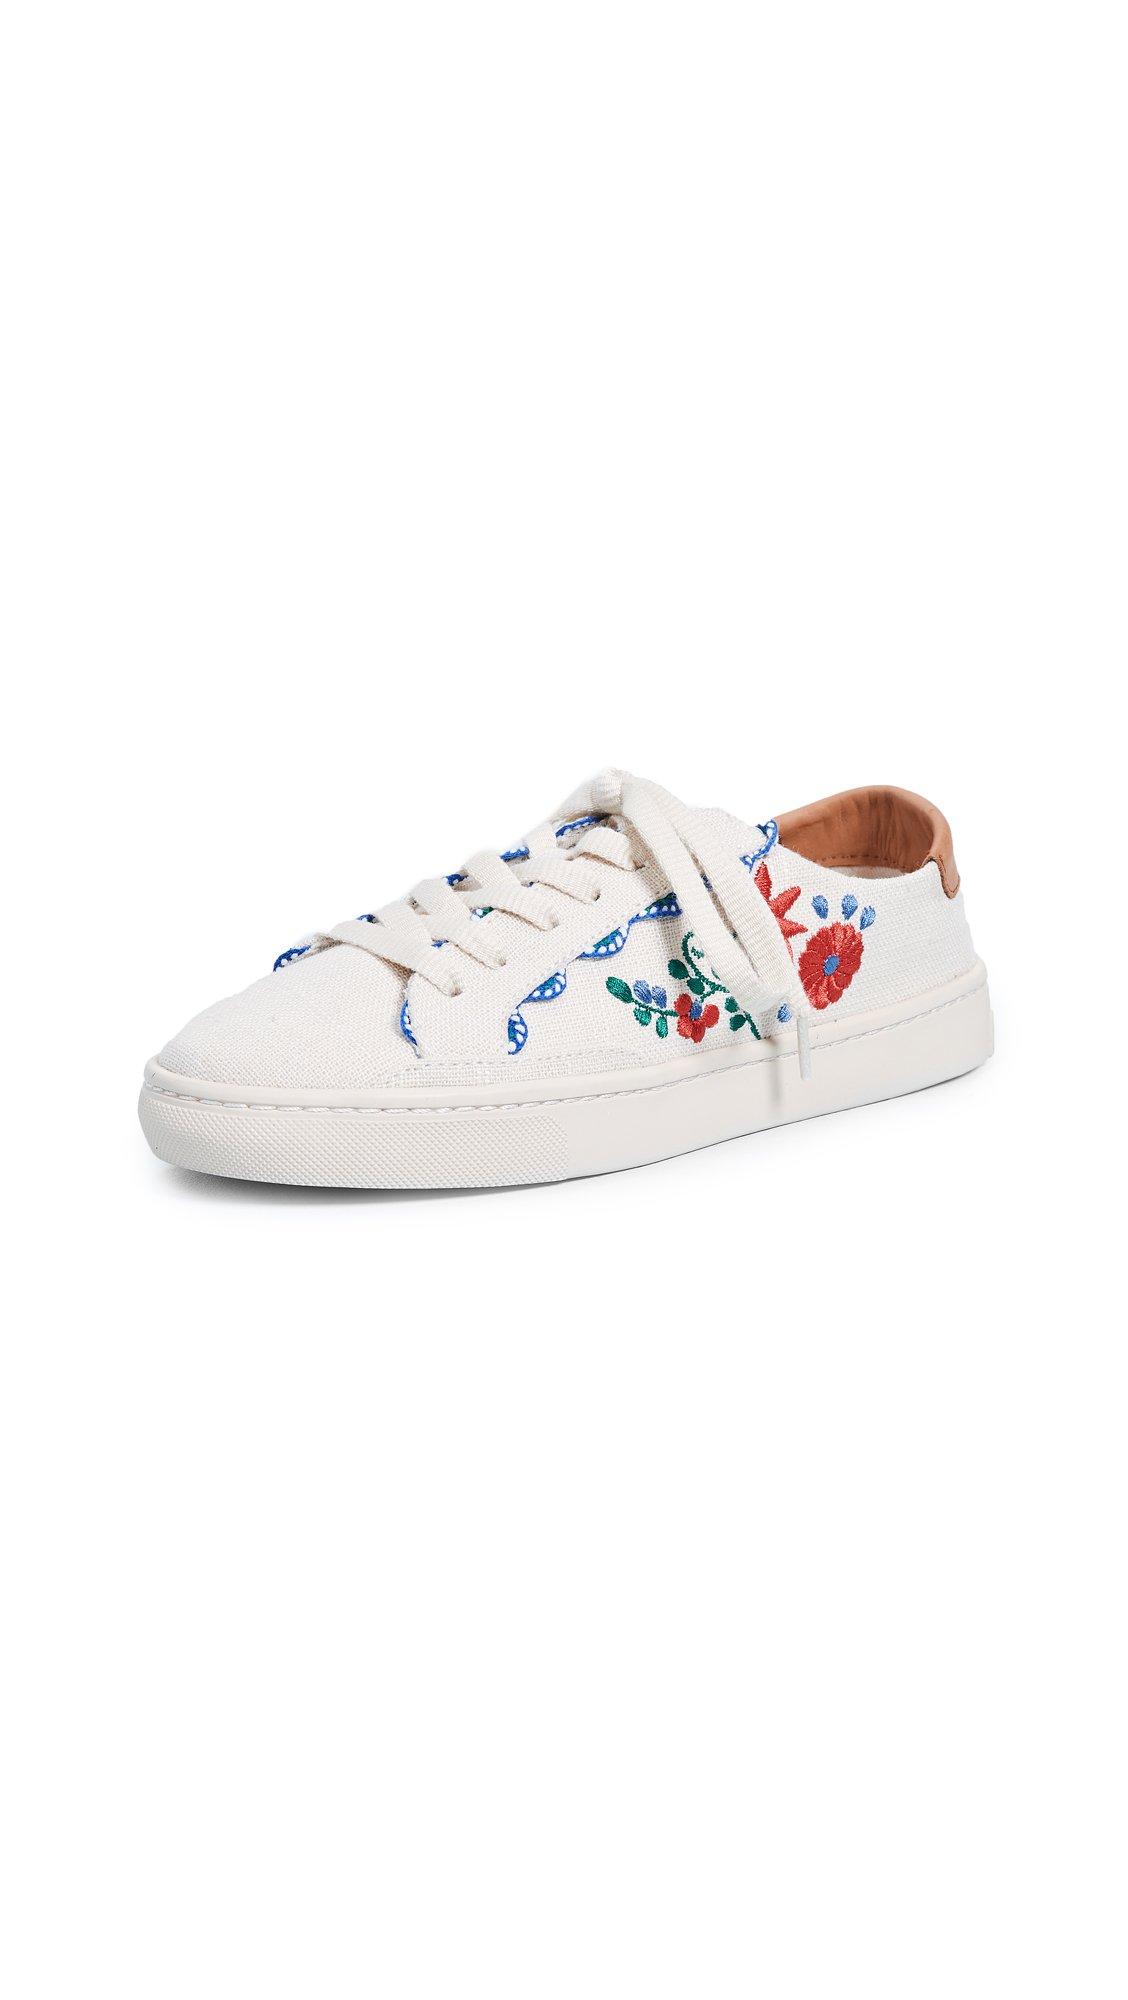 Soludos Women's Ibiza Embroidered Sneaker, Blush, 8.5 Regular US